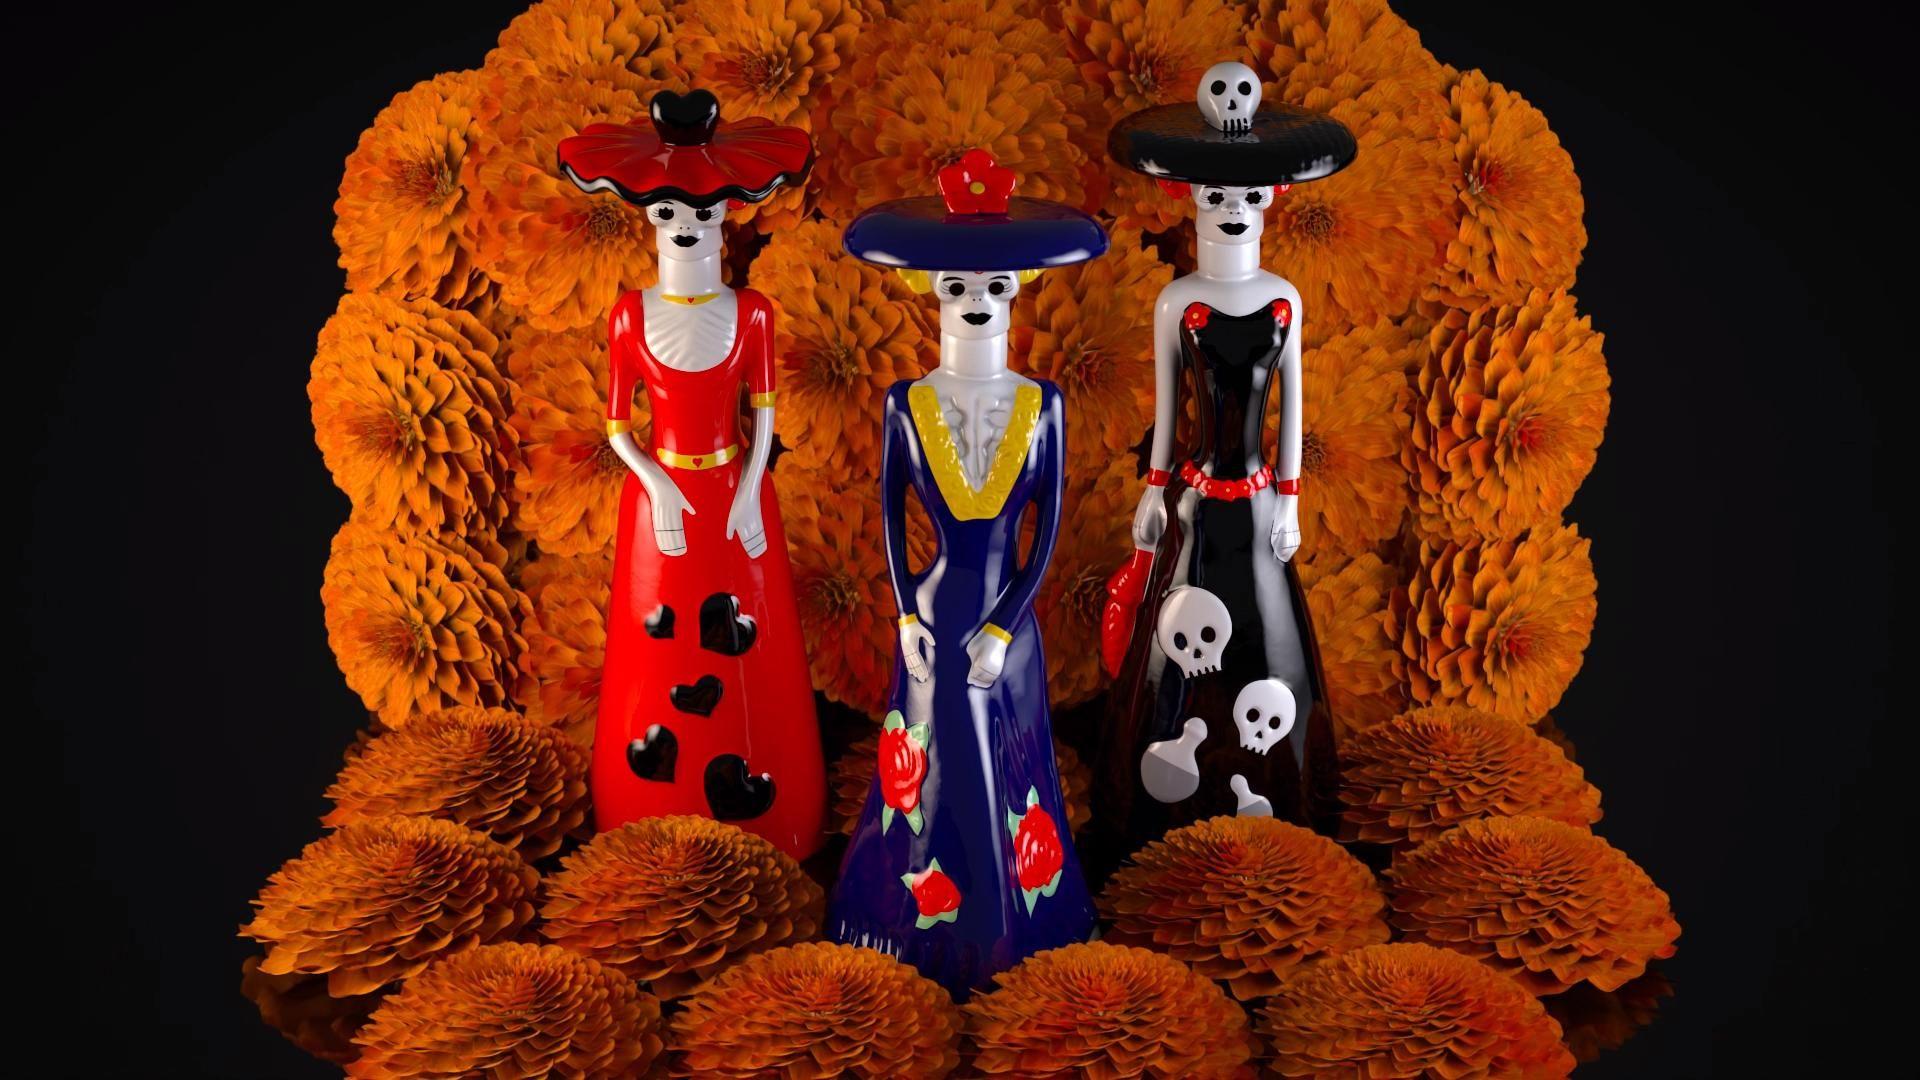 Dona Celia Tequila Video In 2020 Day Of The Dead Diy Sugar Skull Illustration Tequila